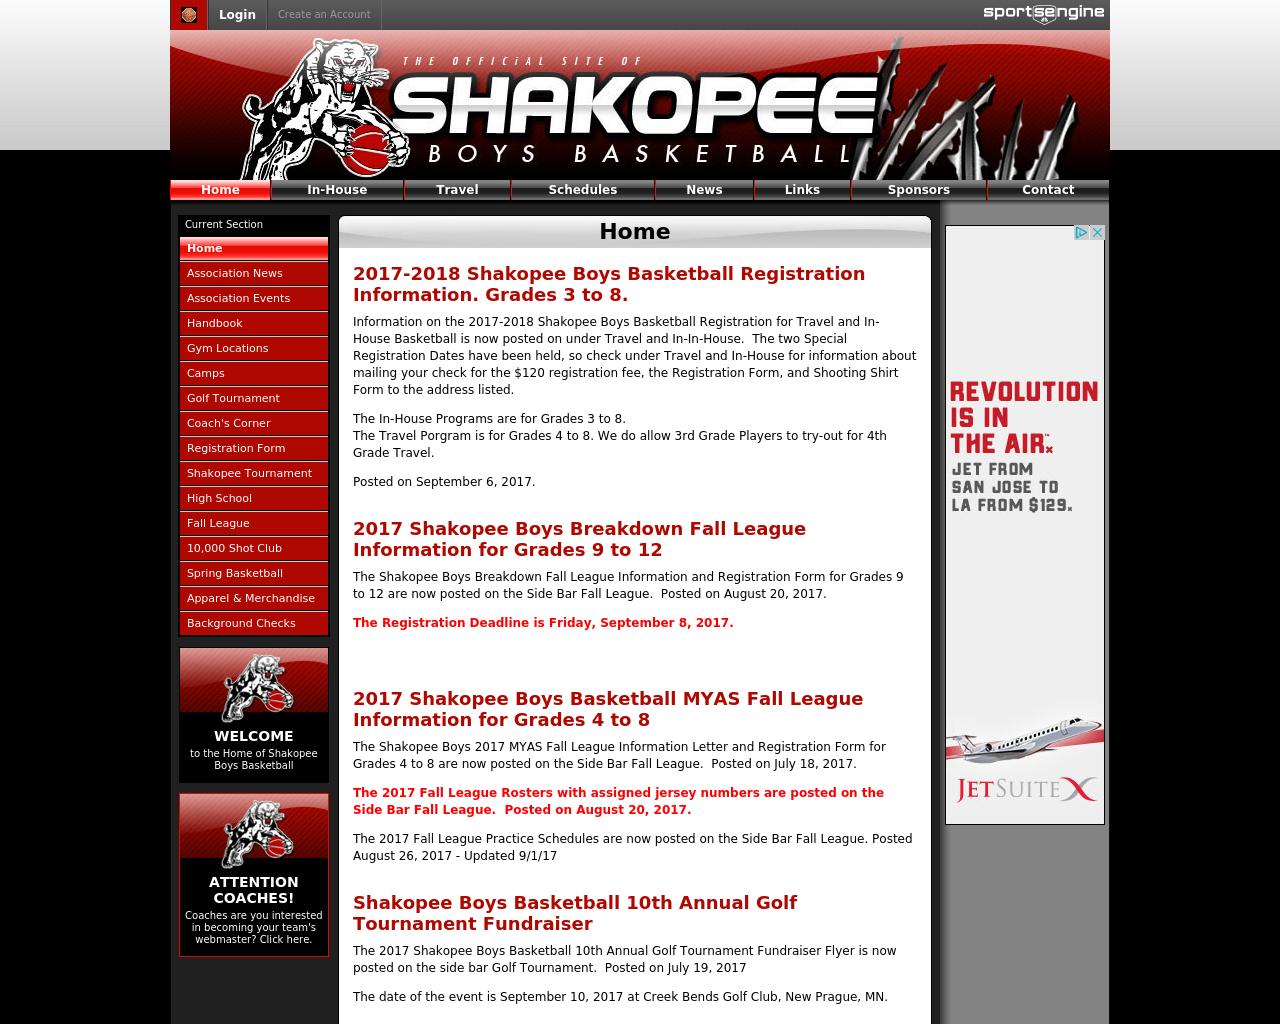 Shakopee-Boys-Basketball-Advertising-Reviews-Pricing